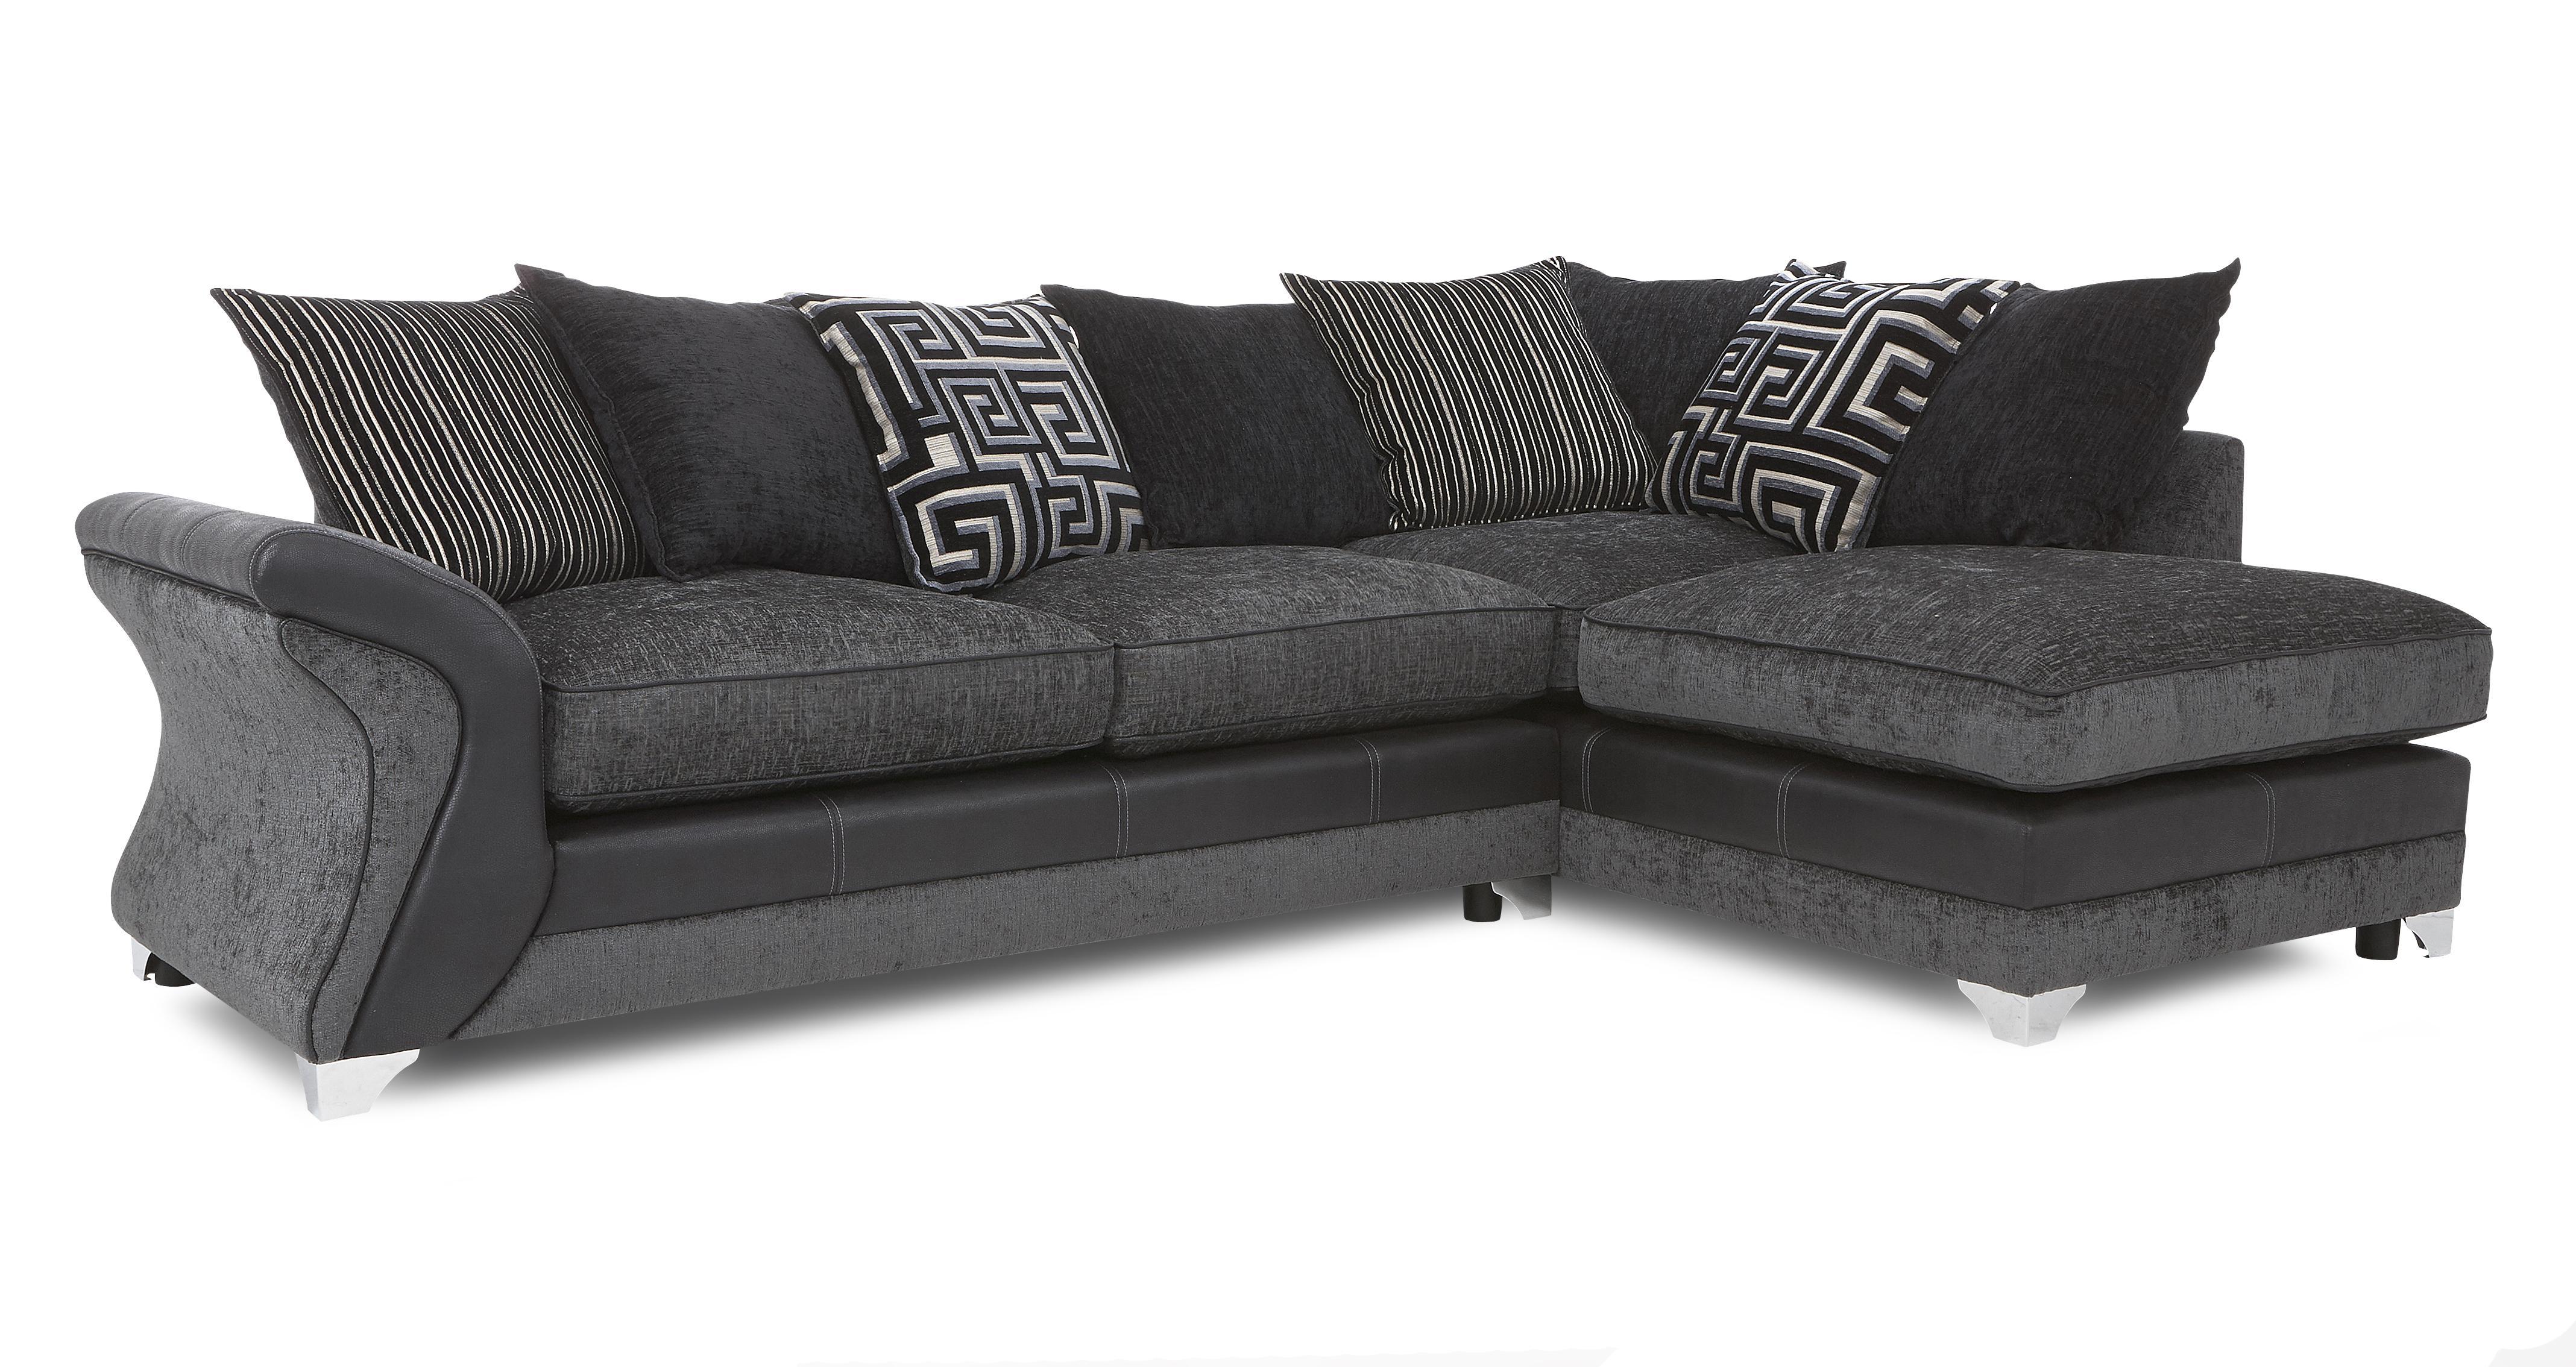 dfs corner sofa and swivel chair ottawa senators boston bruins sofascore dare charcoal fabric set inc chaise